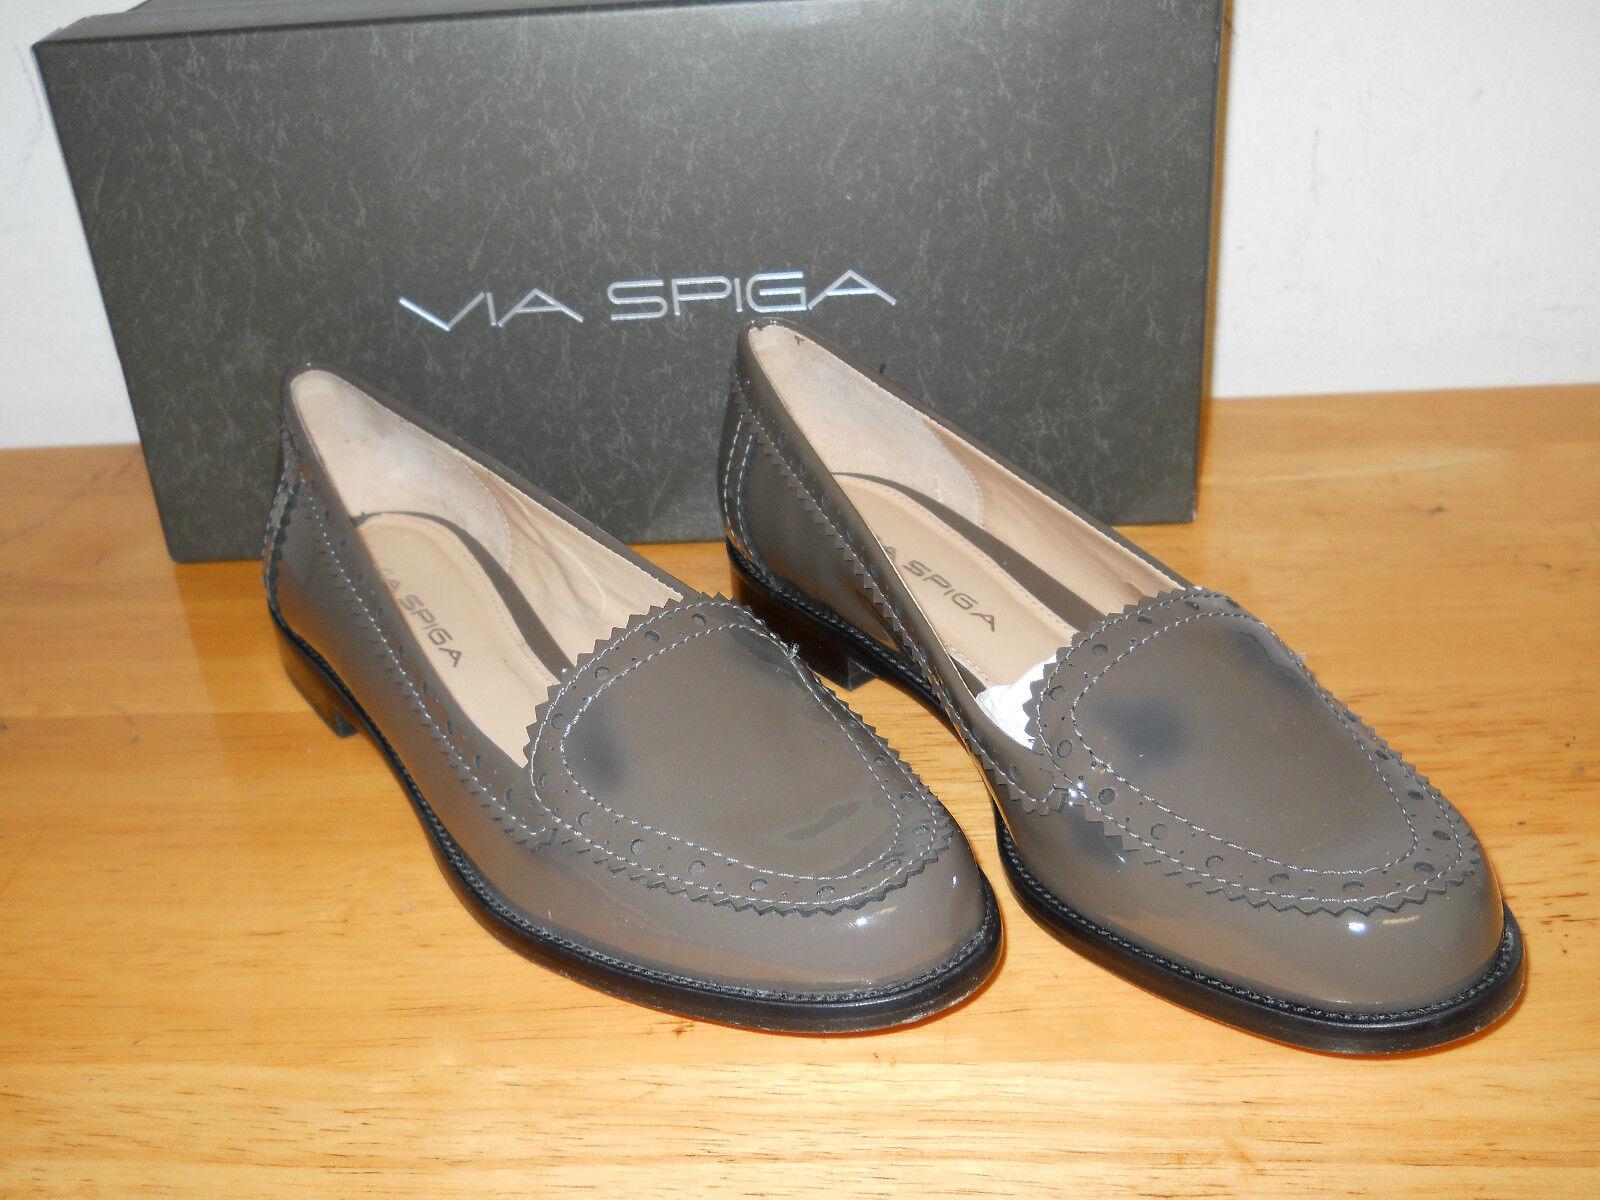 Via Spiga NEU Damenschuhe V-Rey Granite Patent Loafers 5.5 M Schuhes NWB